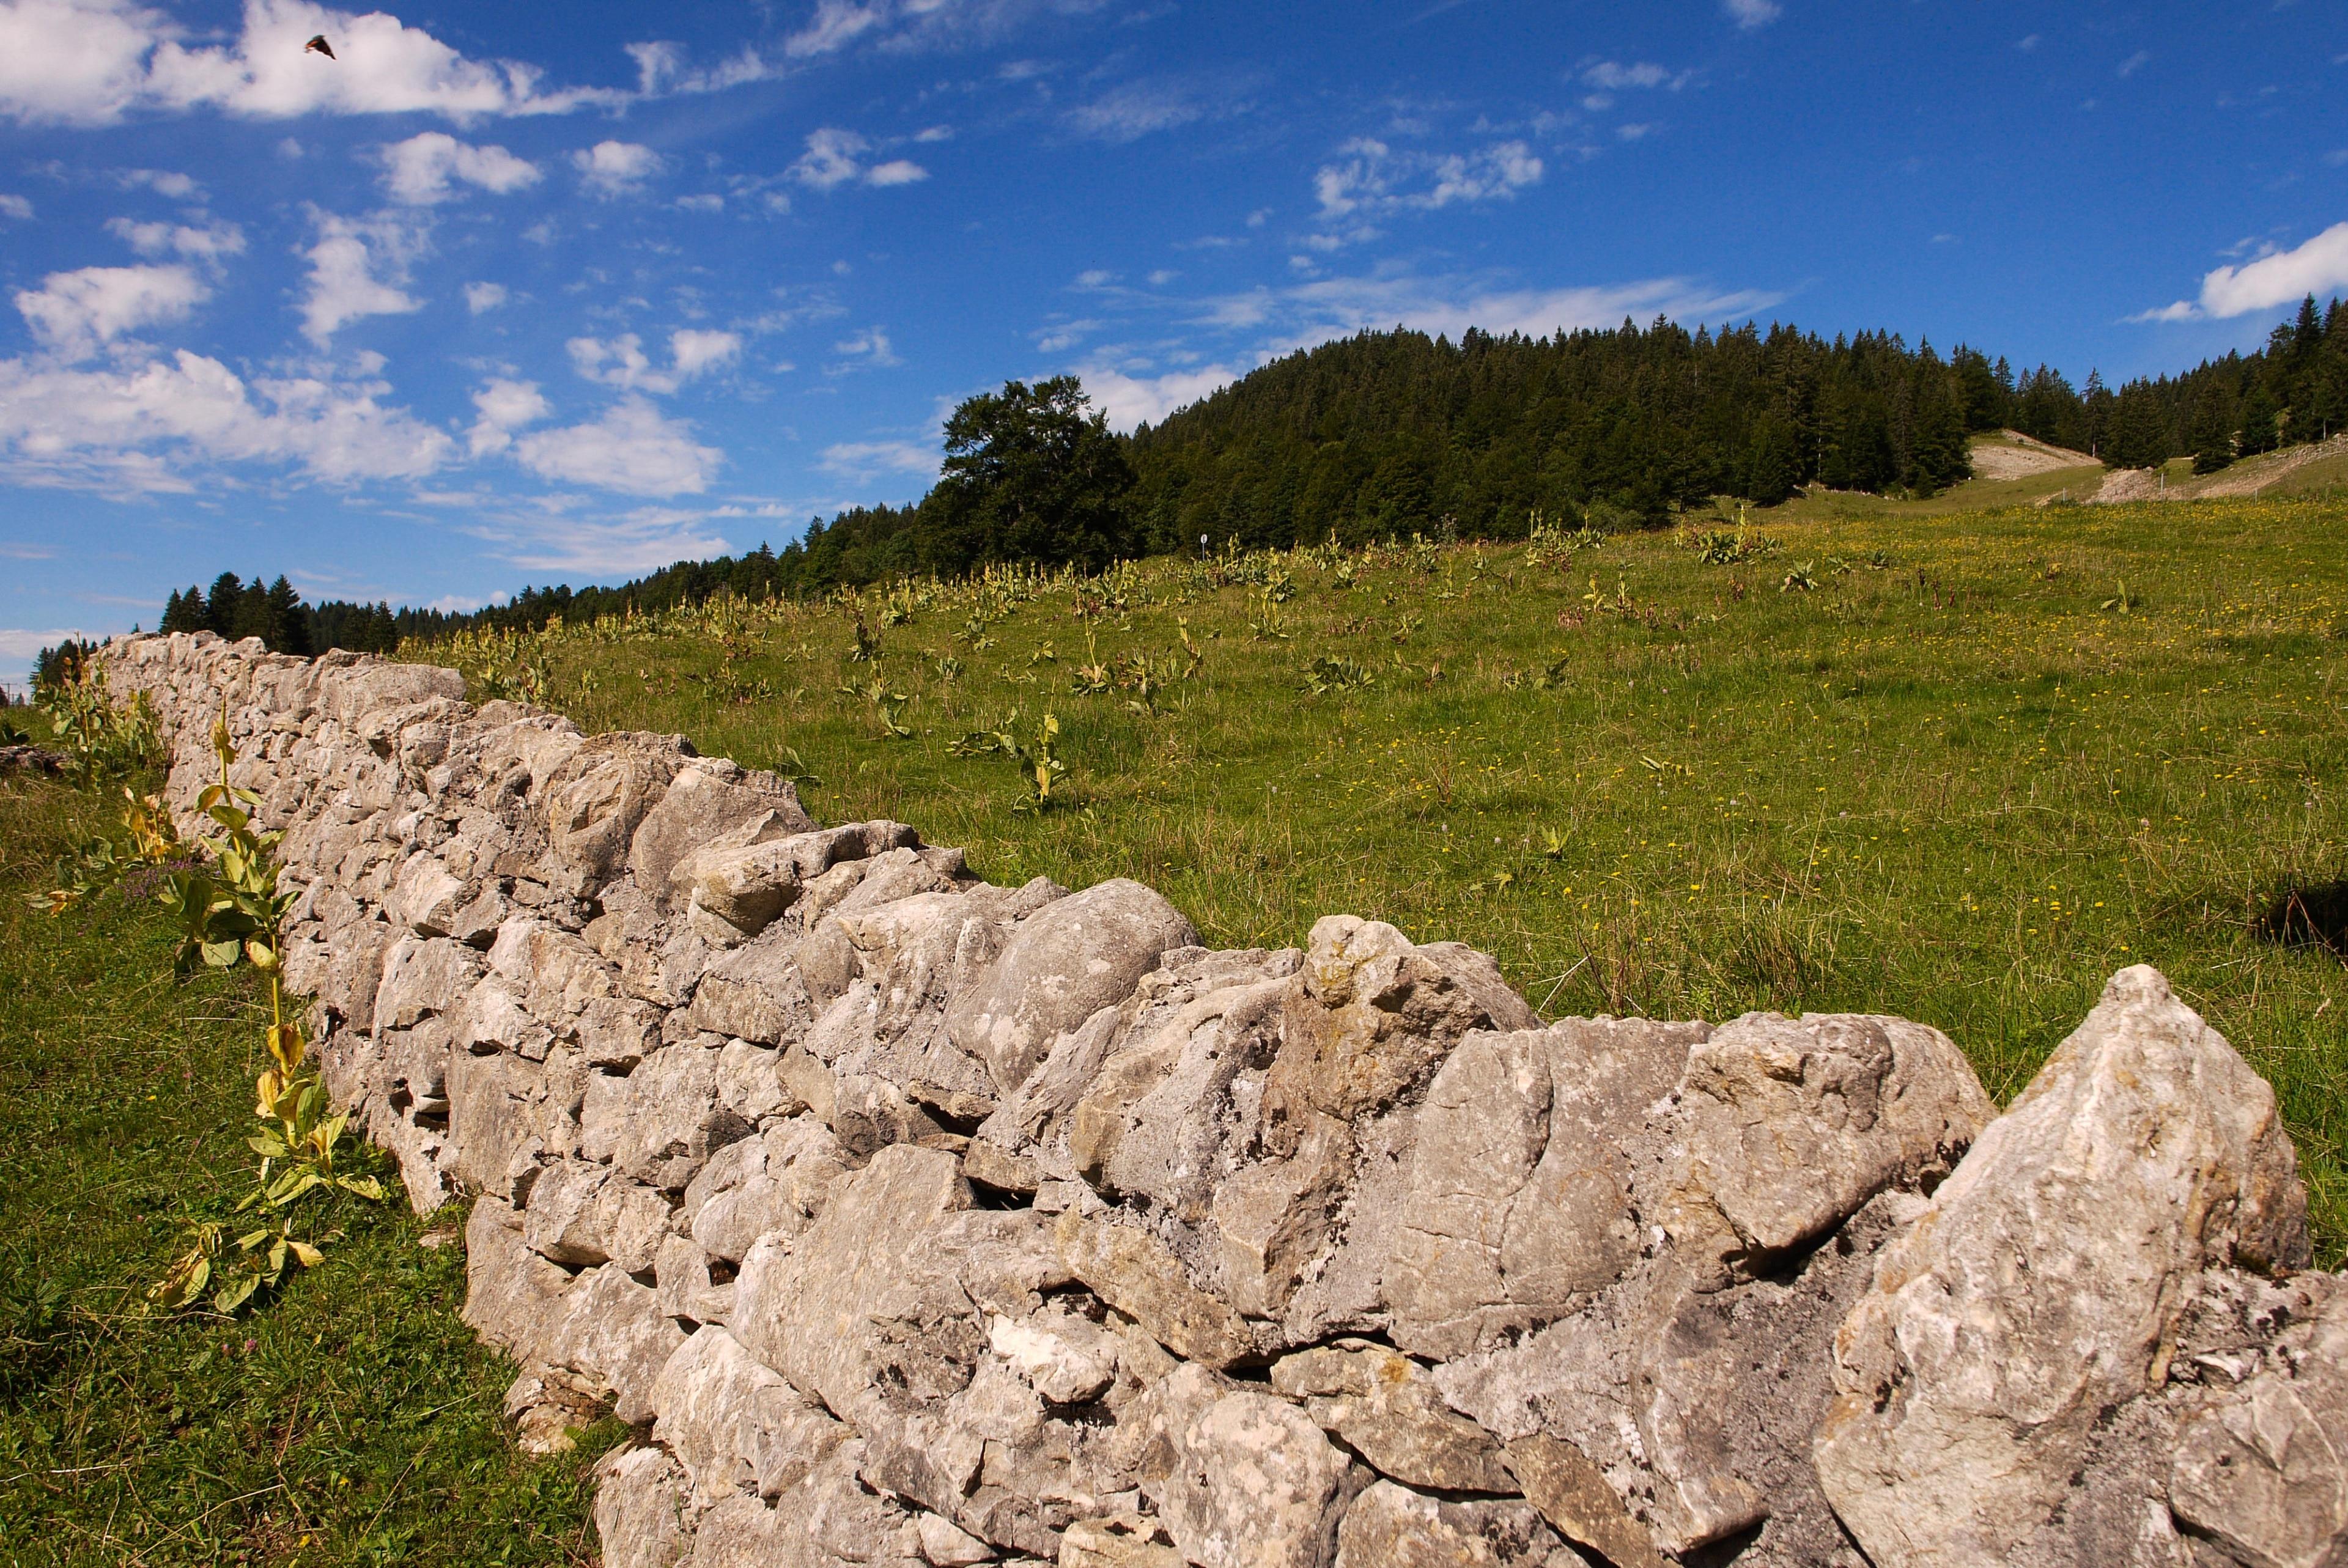 Parc naturel régional du Haut-Jura, Jura (departement), Frankrijk